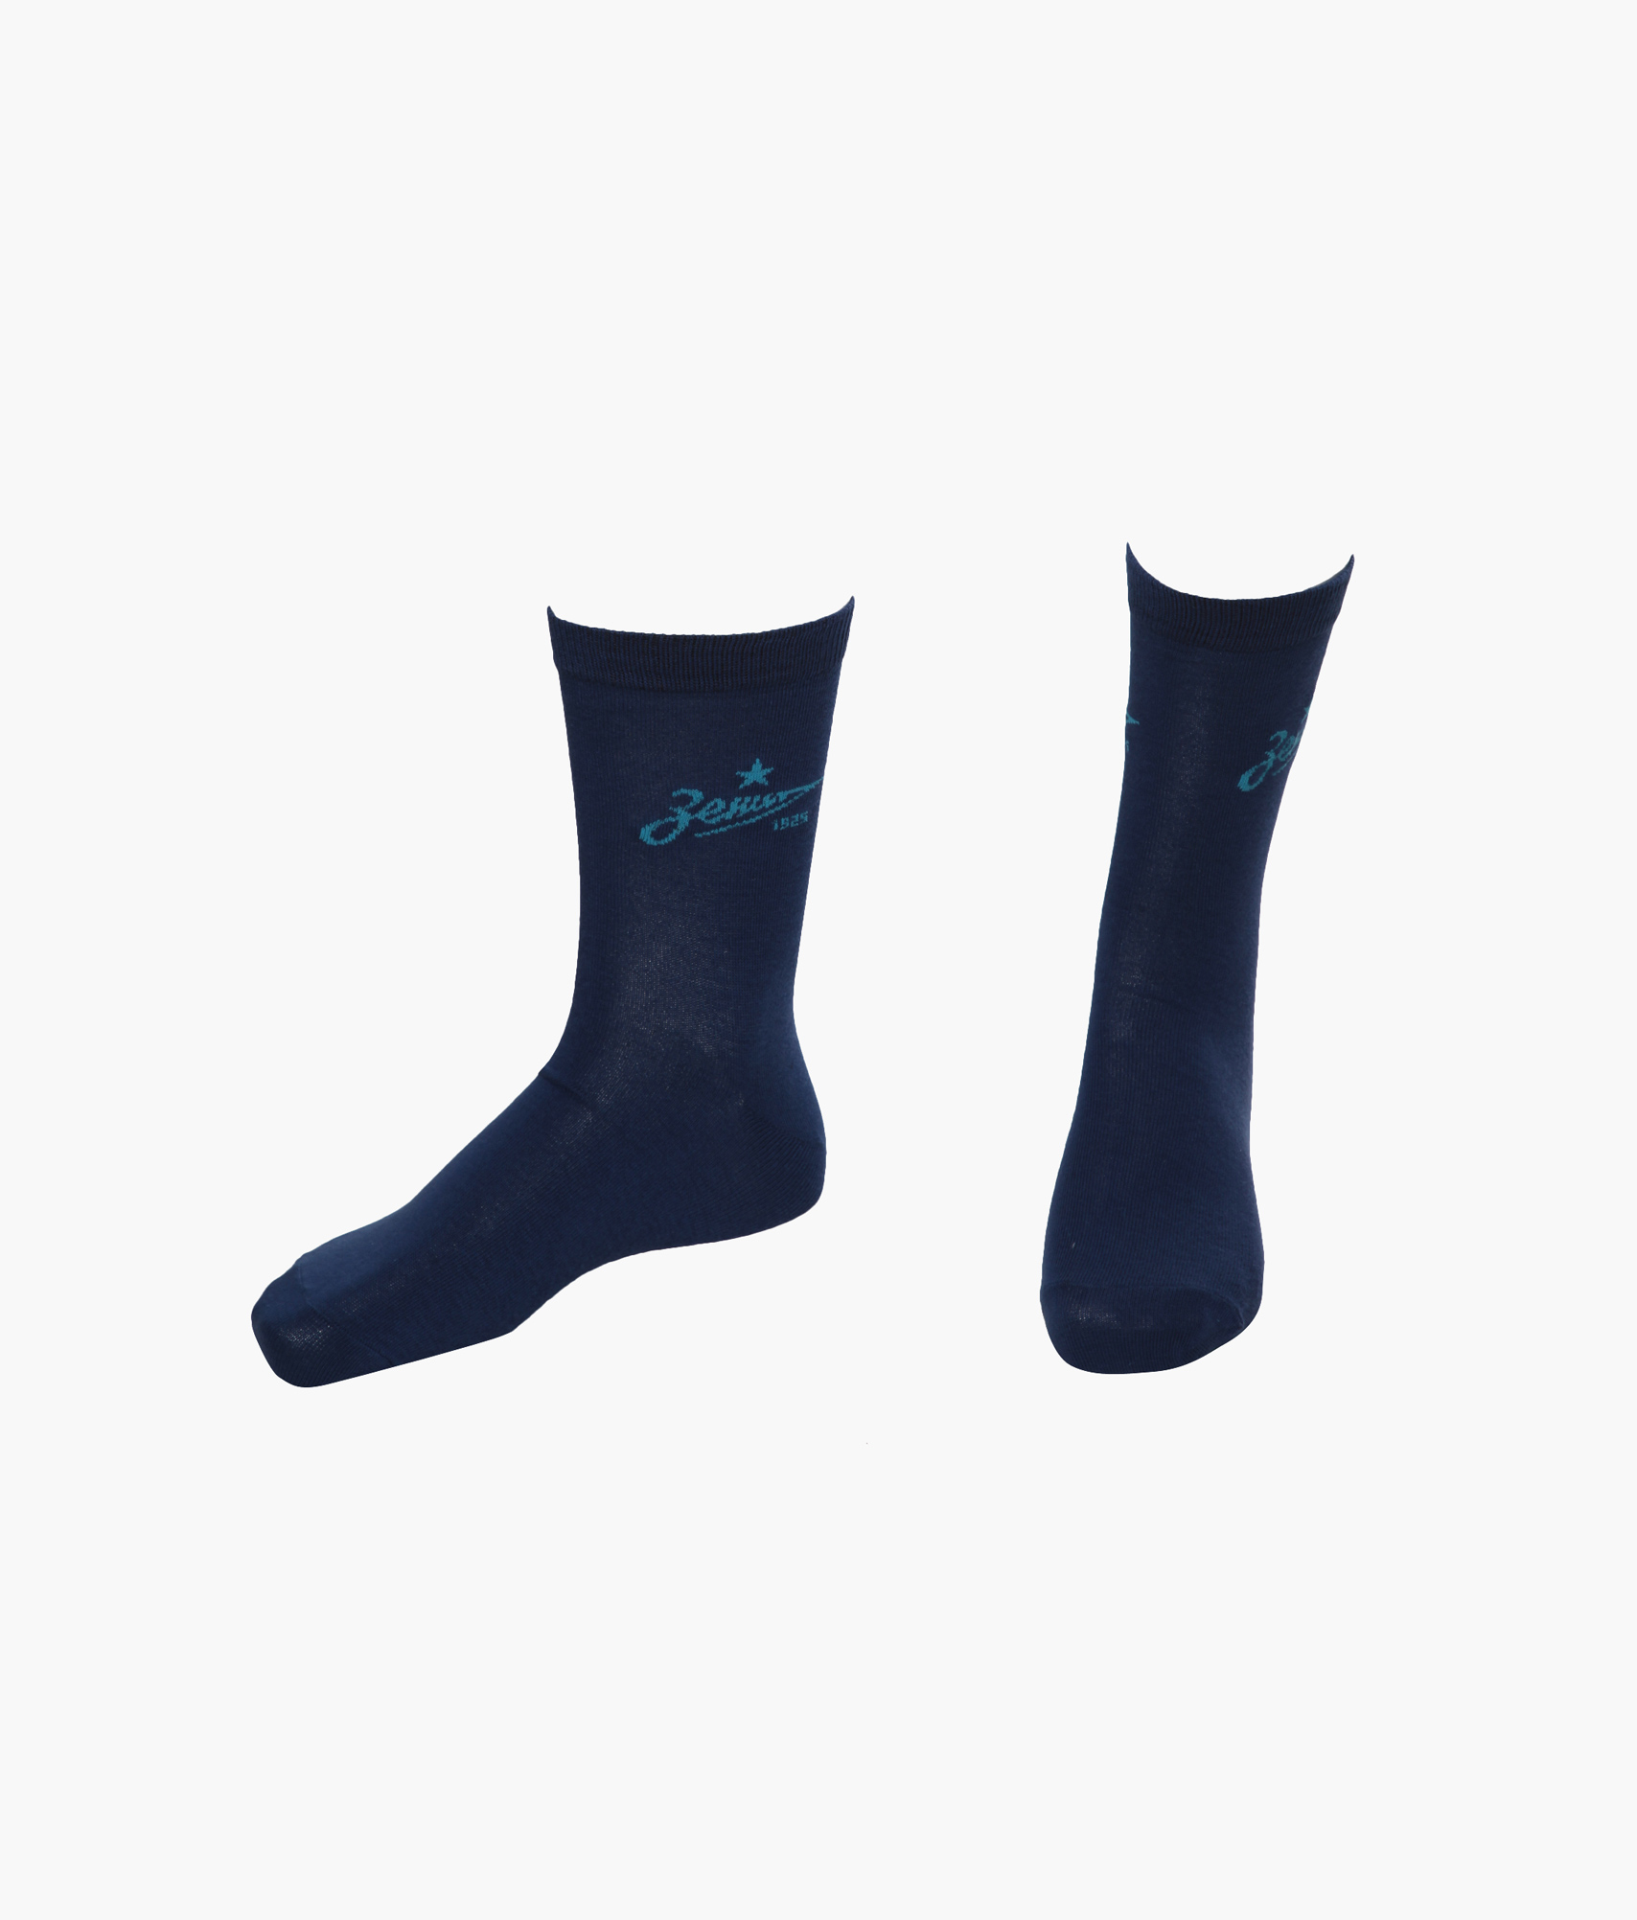 Носки мужские Зенит Цвет-Темно-Синий носки мужские arktur цвет темно серый л 209 размер 44 45